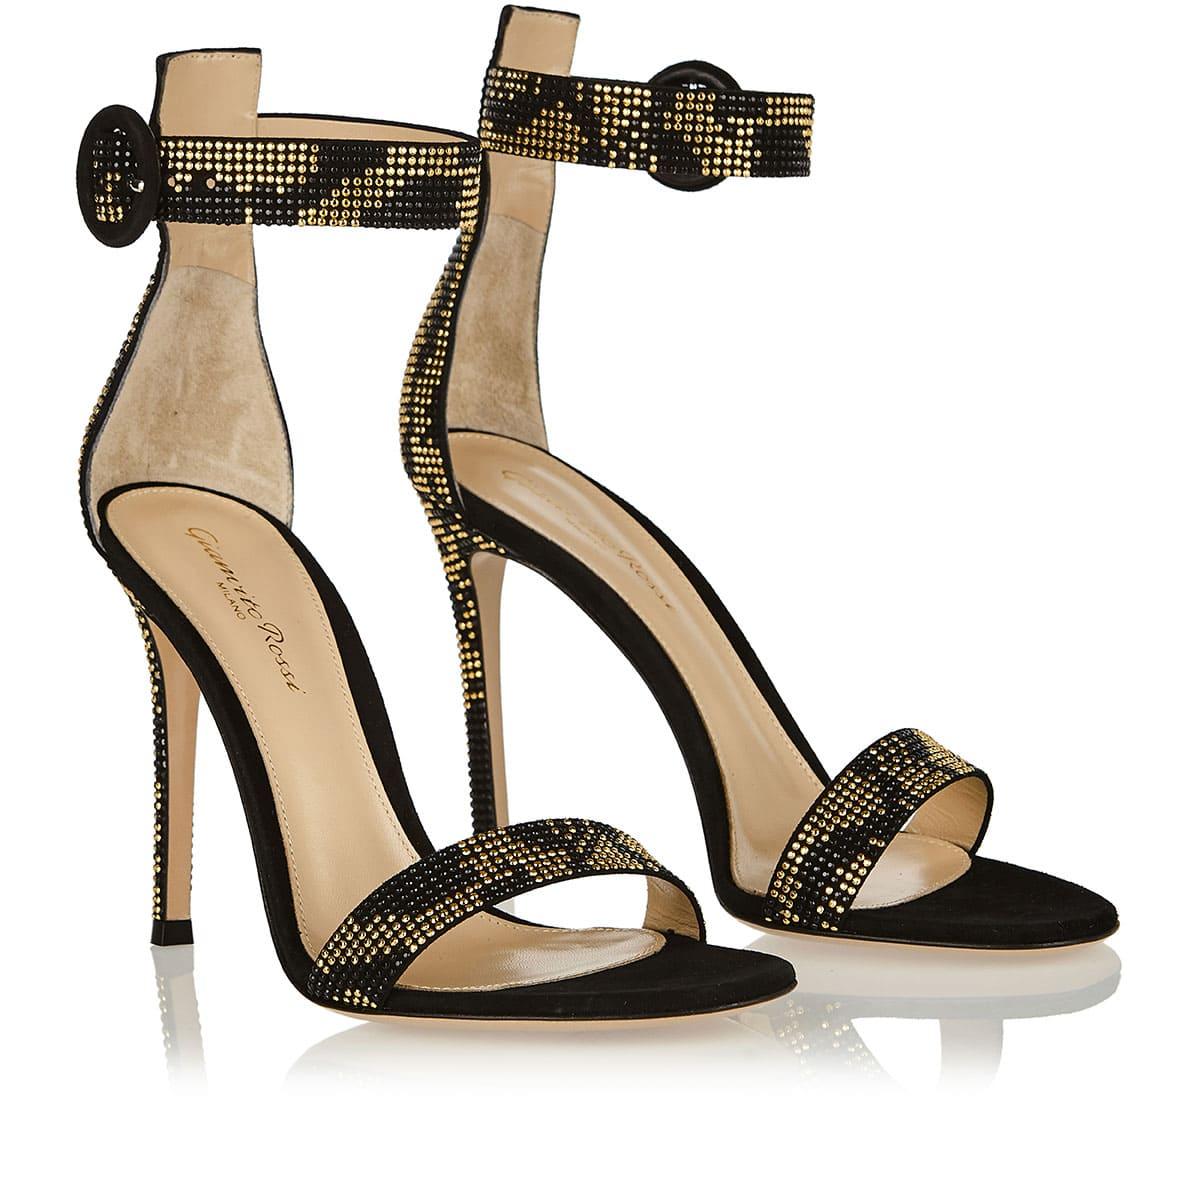 Ronnie stud-embellished sandals